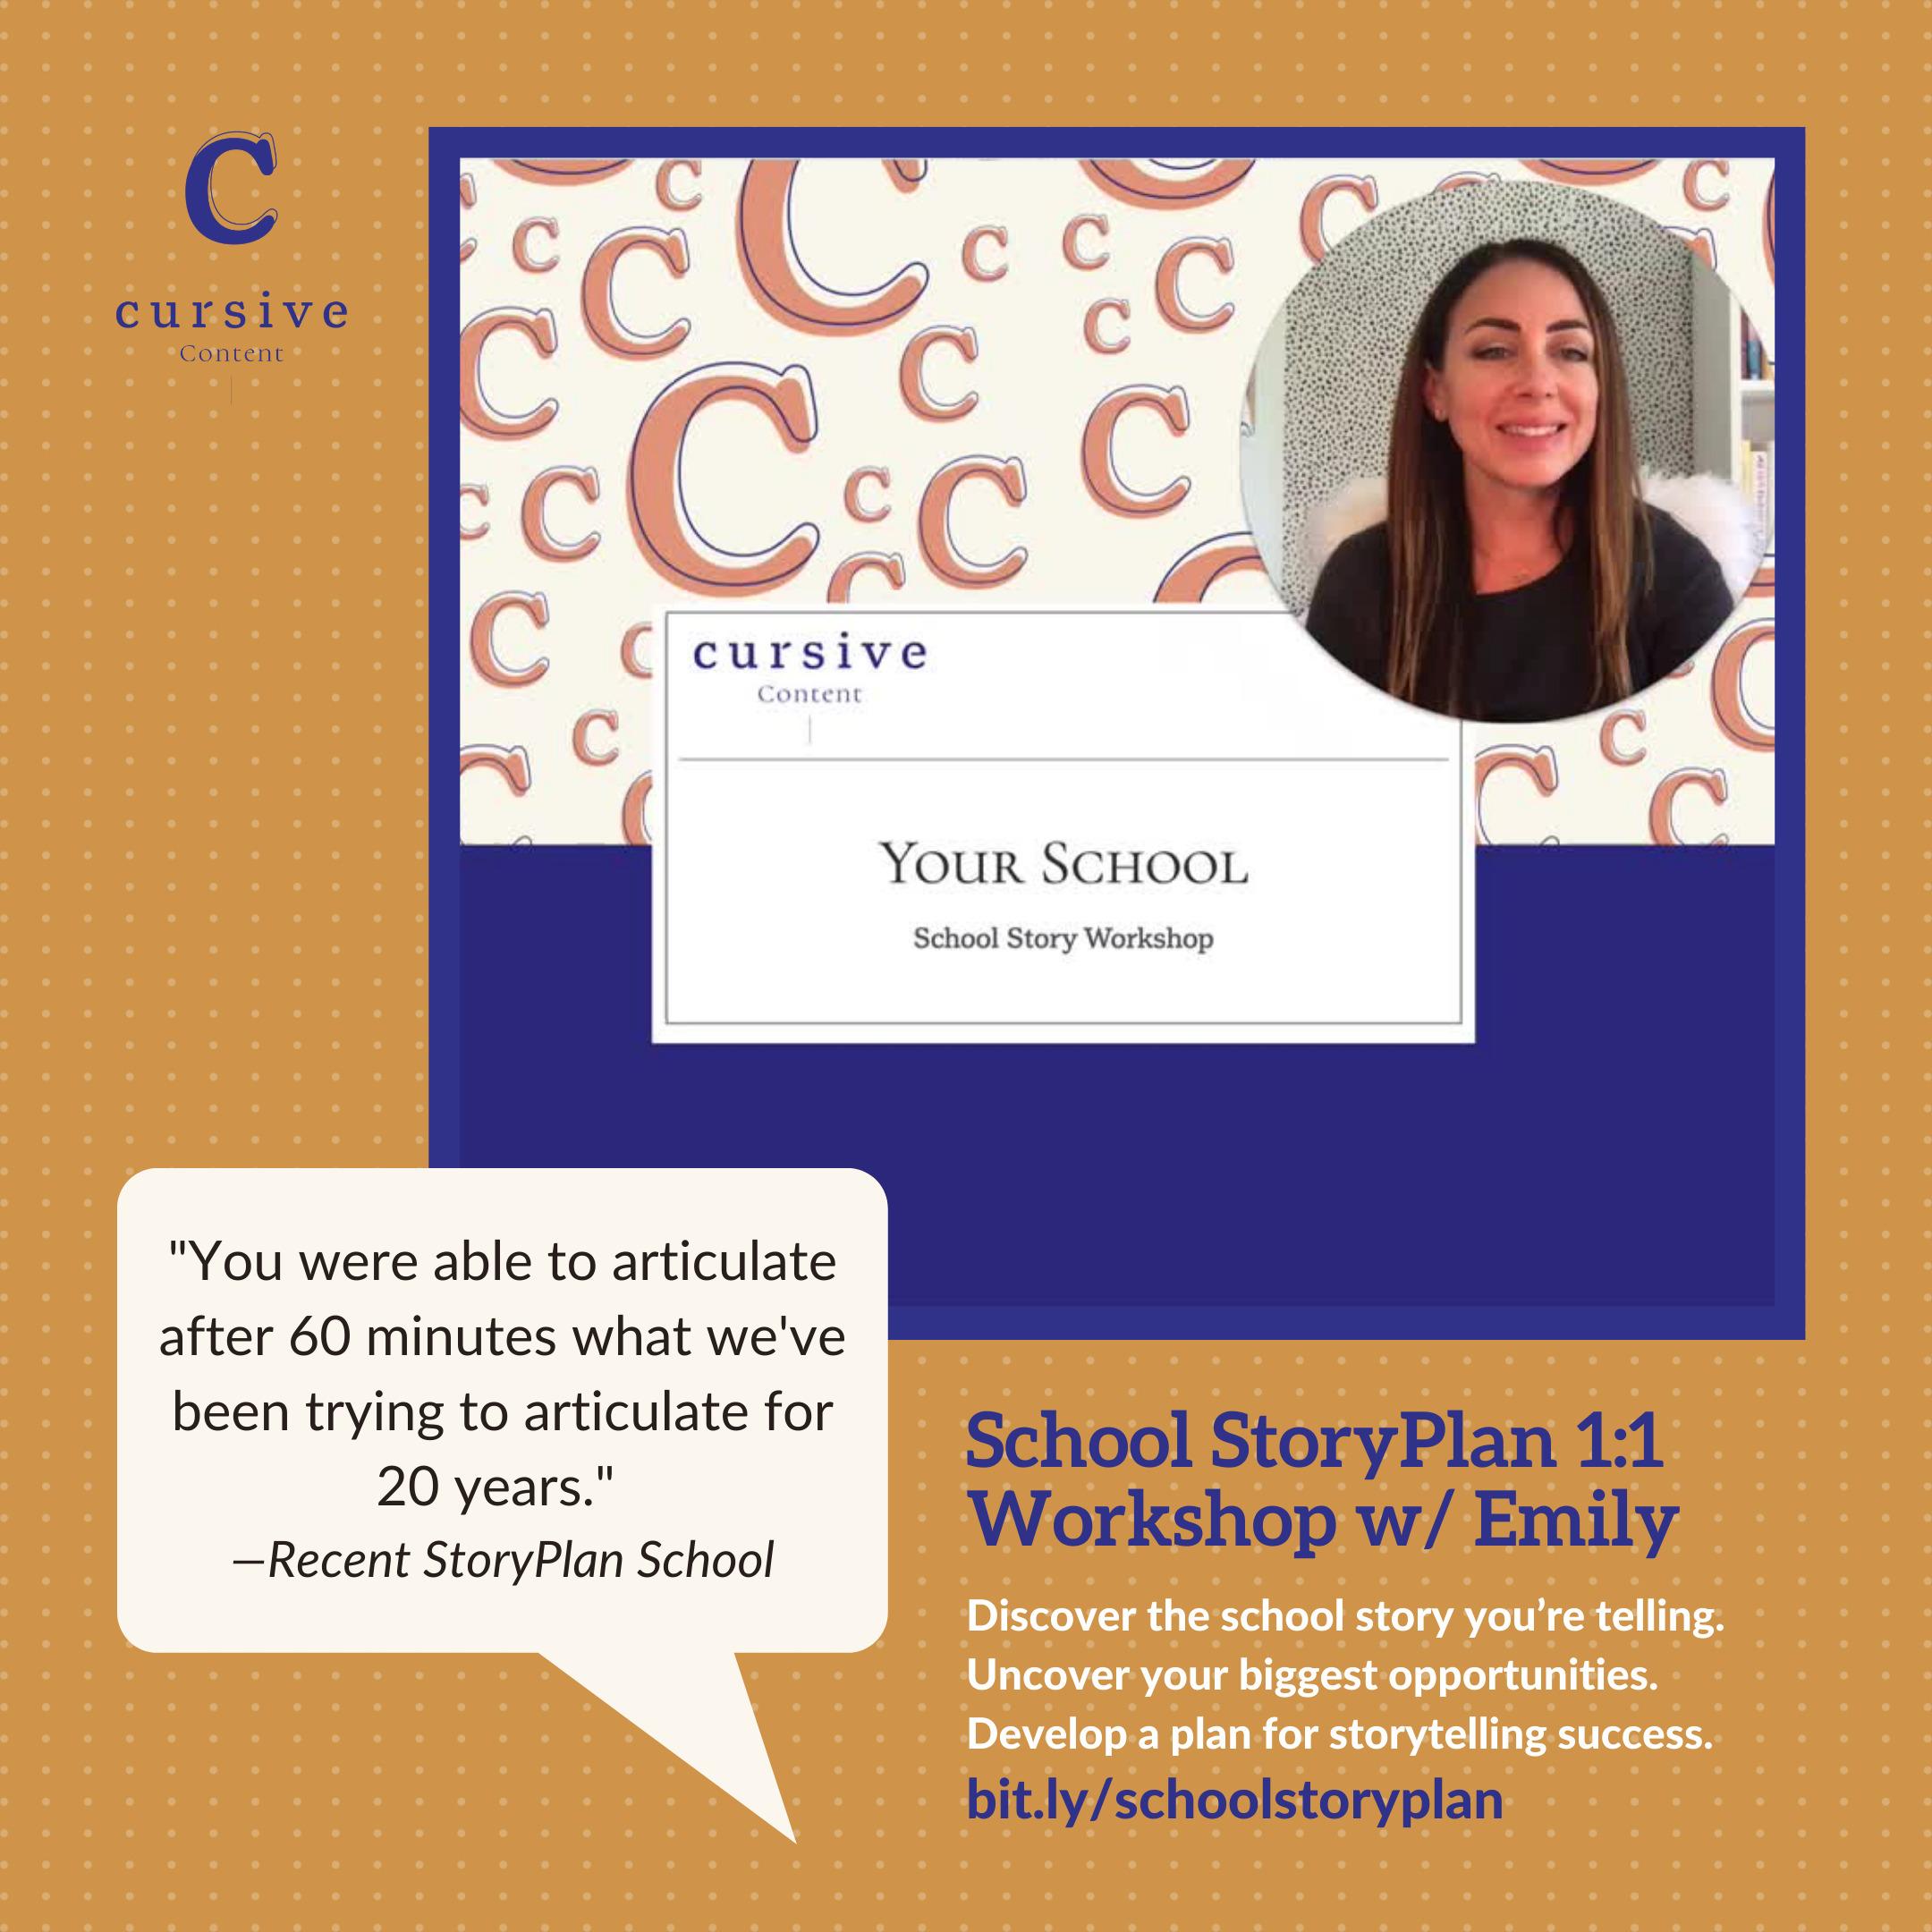 School StoryPlan Workshop